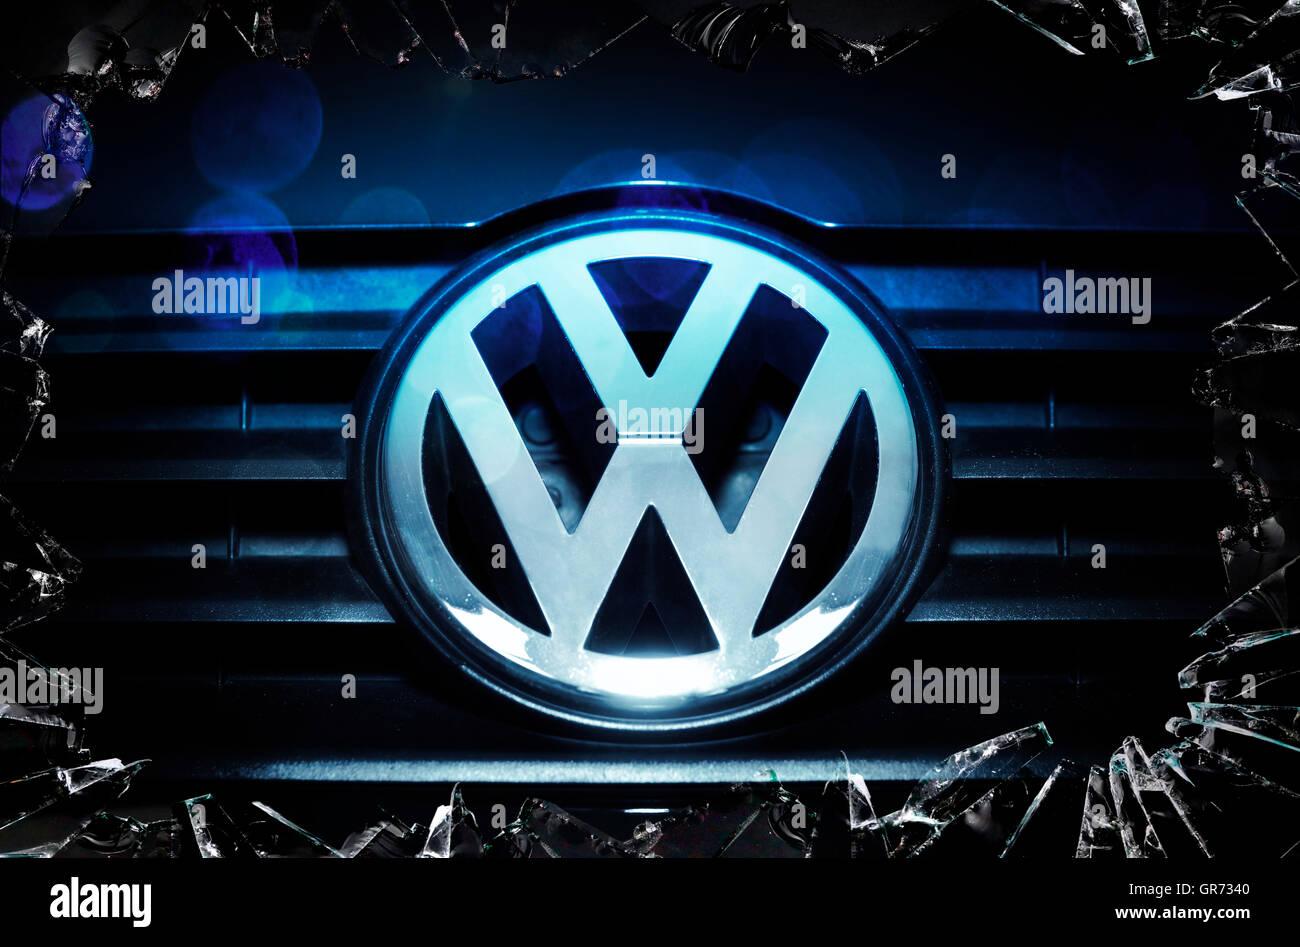 Vw Emblem, Vw Exhaust Gases Scandal - Stock Image